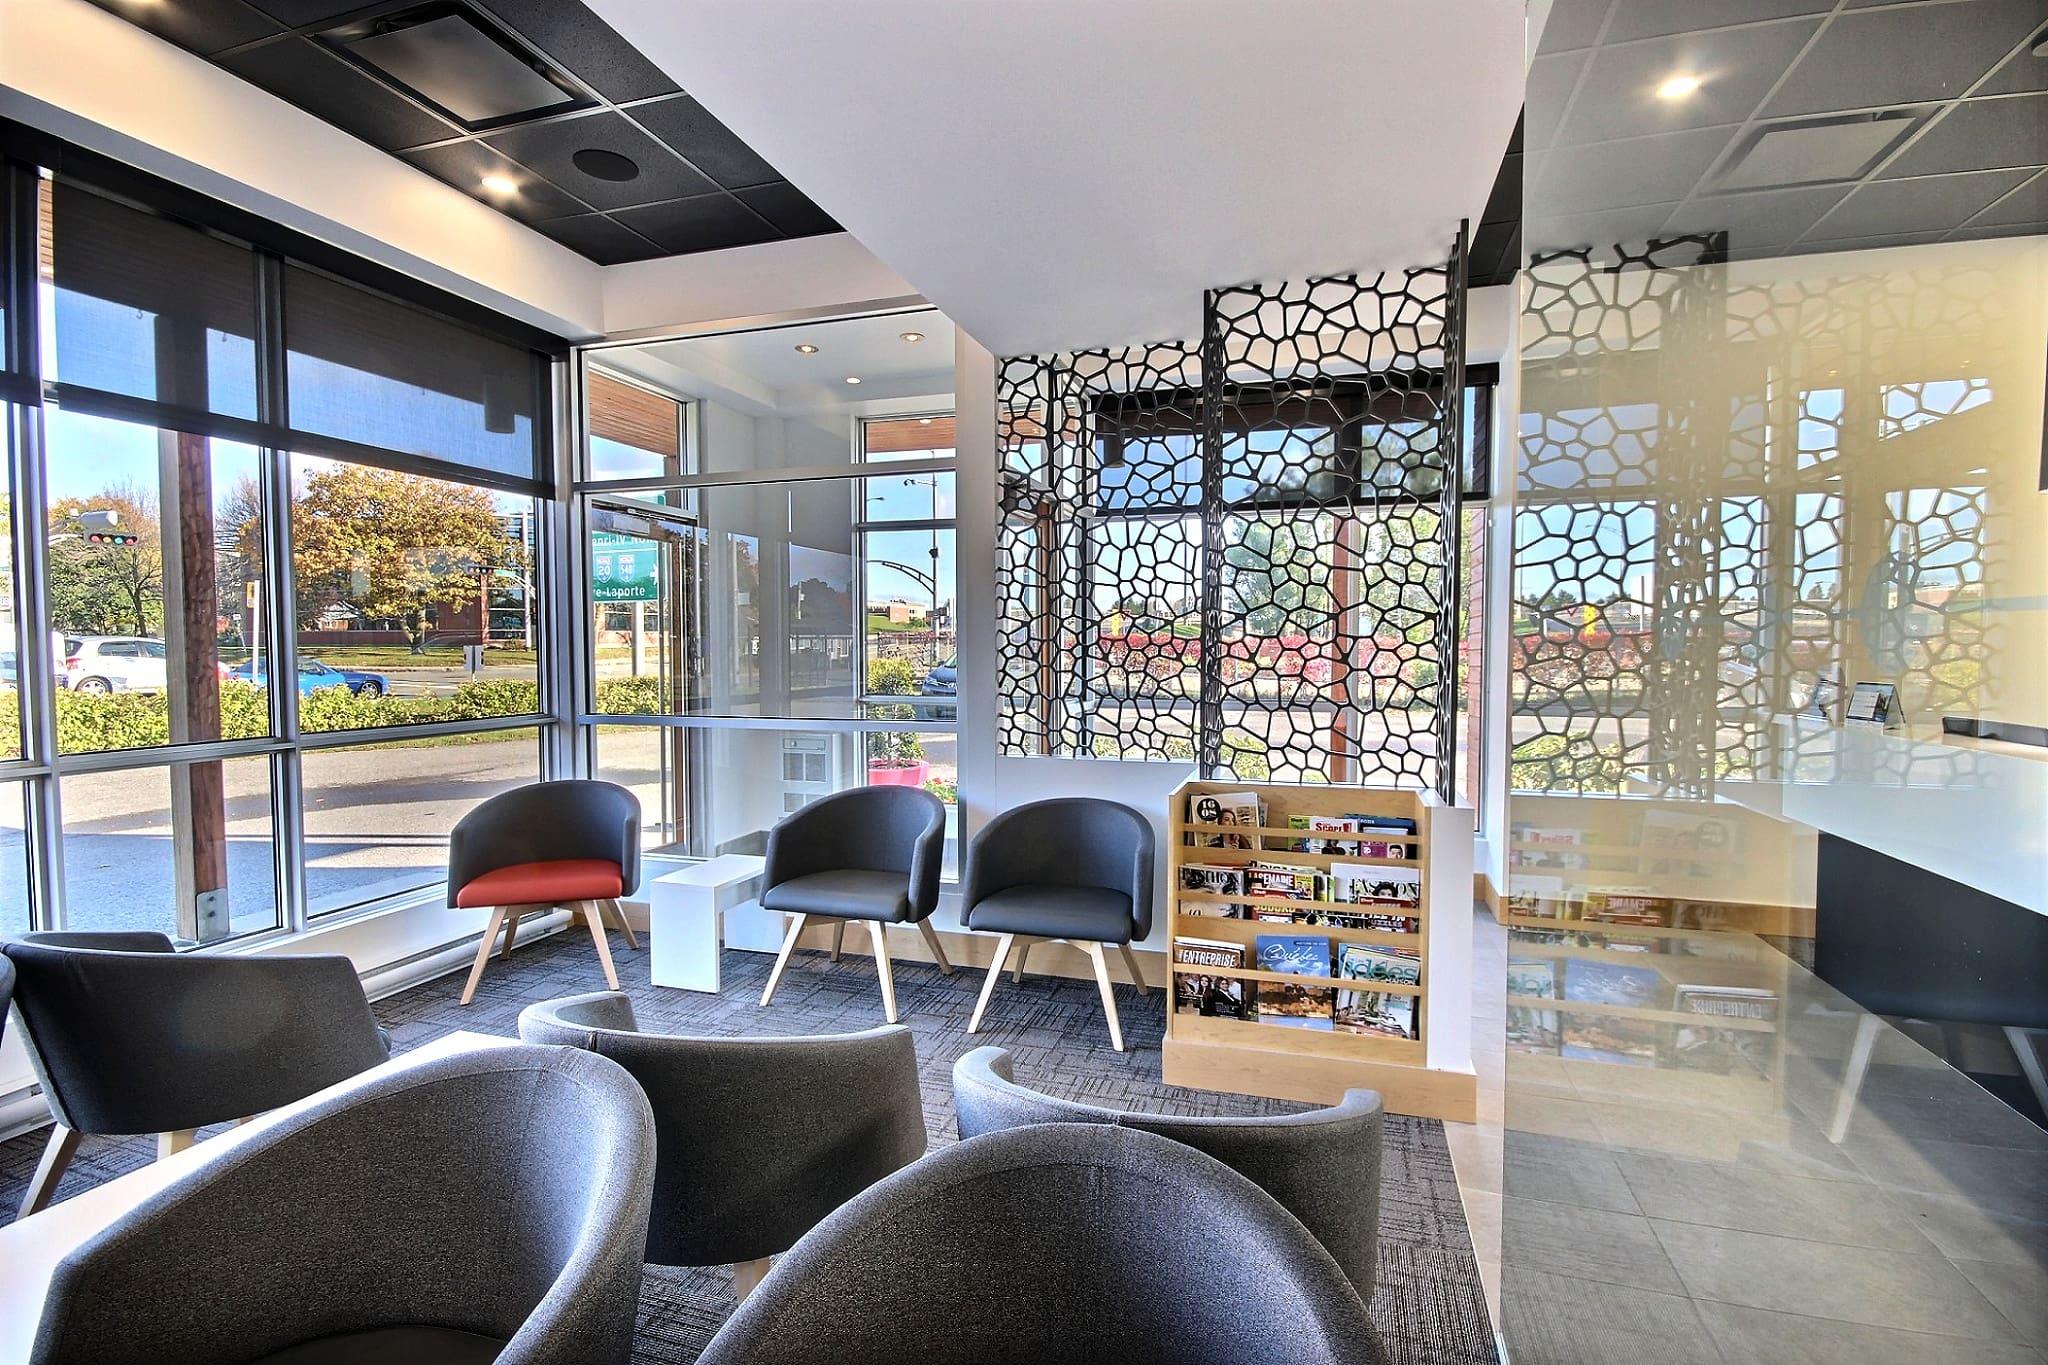 Design moderne salle d'attente